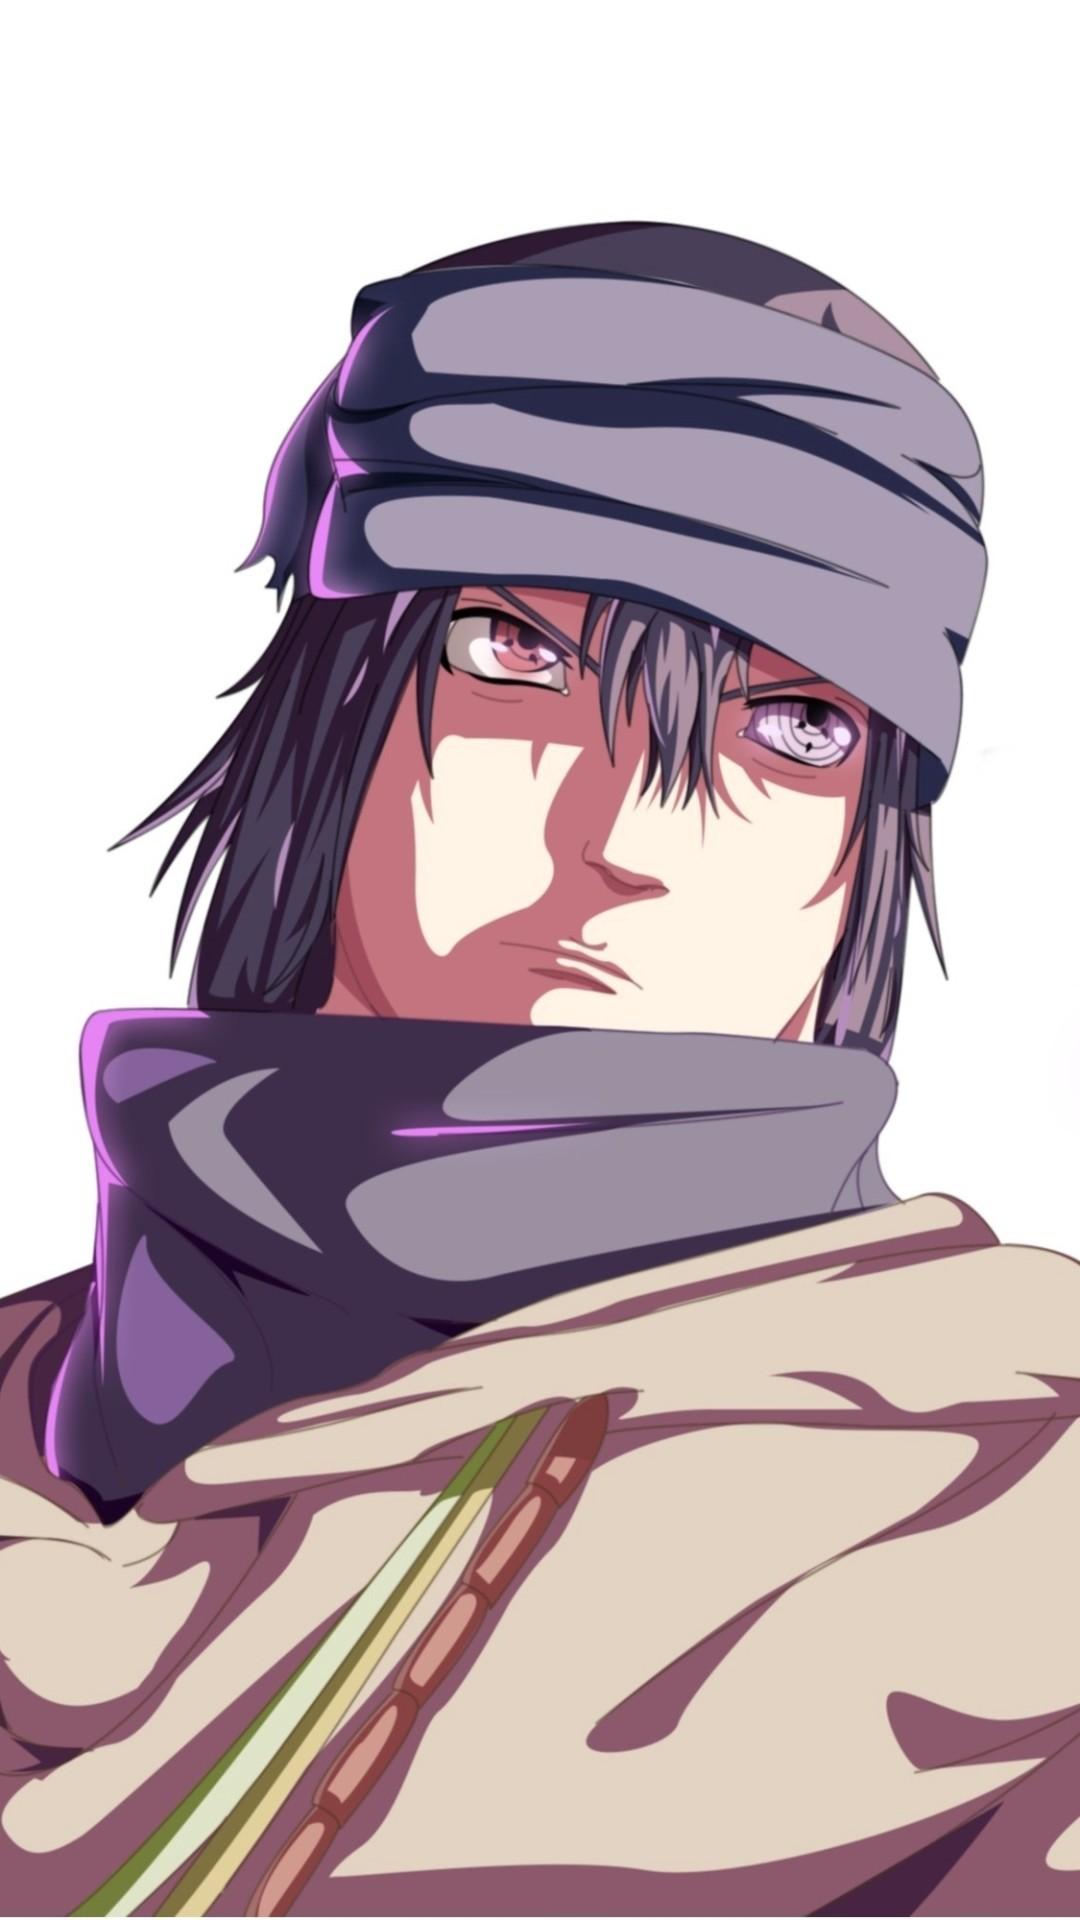 Sasuke the last wallpapers - Sasuke naruto ...